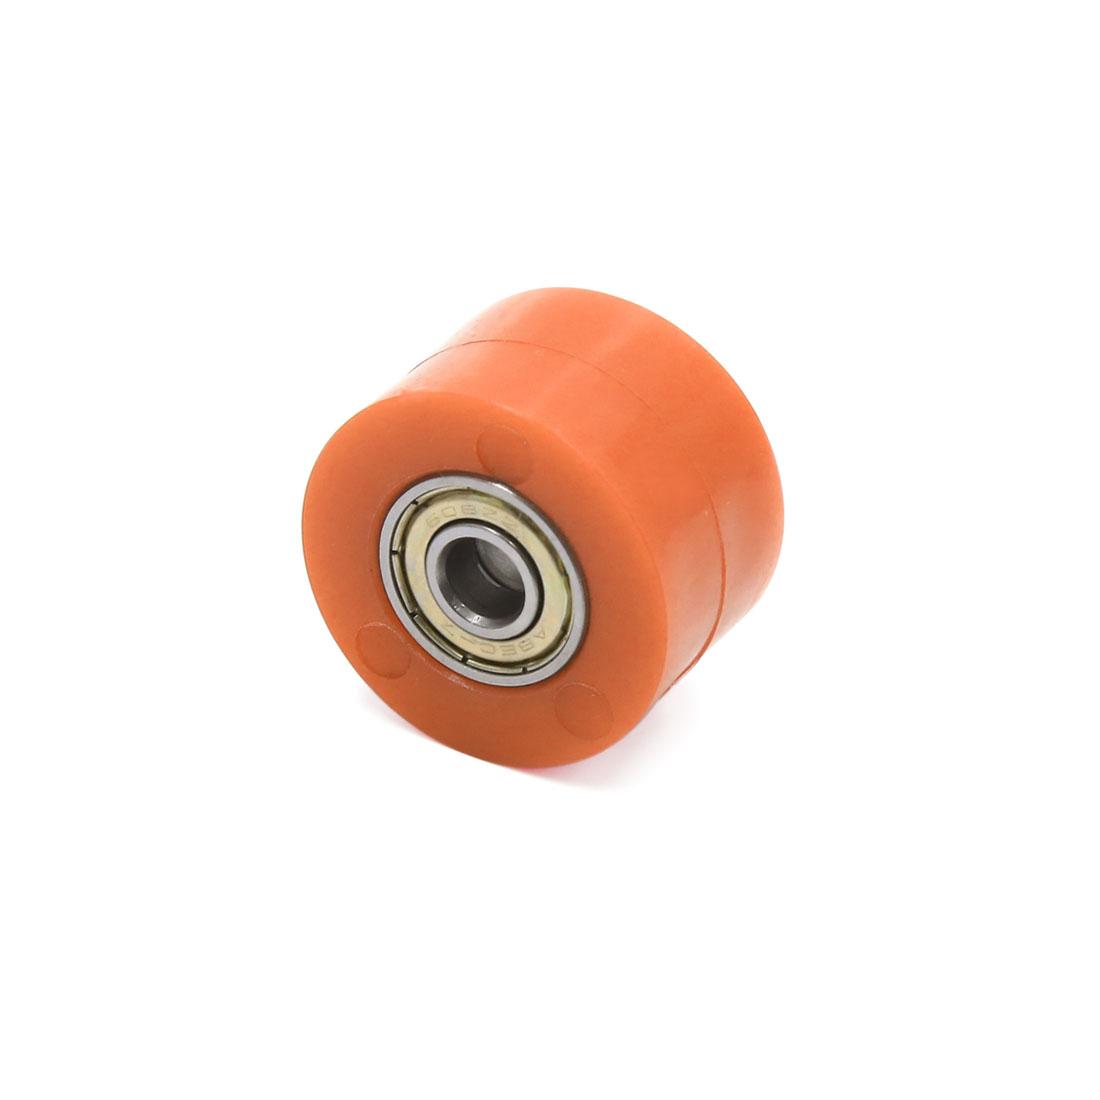 8mm Hole Chain Roller Tensioner Pulley Wheel Sprocket Orange for Motorcycle - image 2 de 3